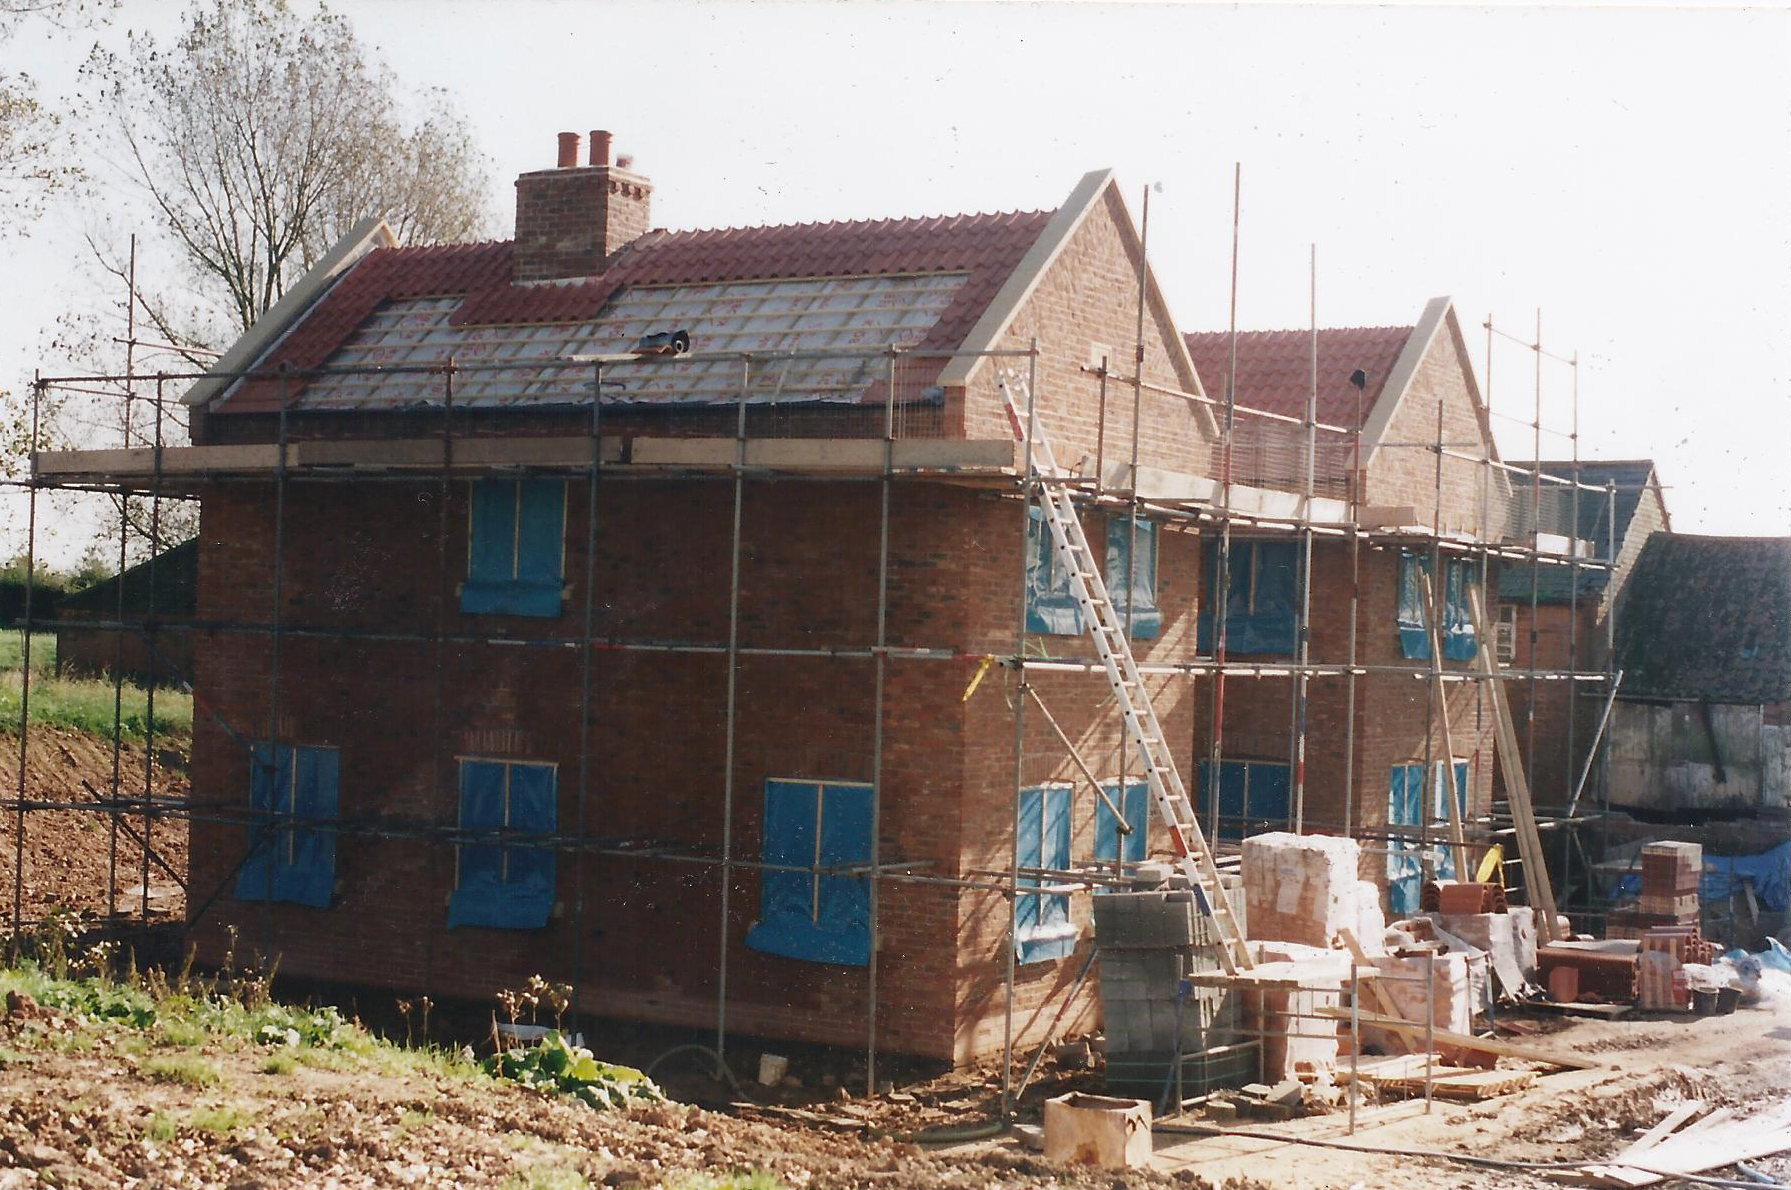 Construction Image 1 - North End Farm - East Yorkshire Architects - Samuel Kendall Associates